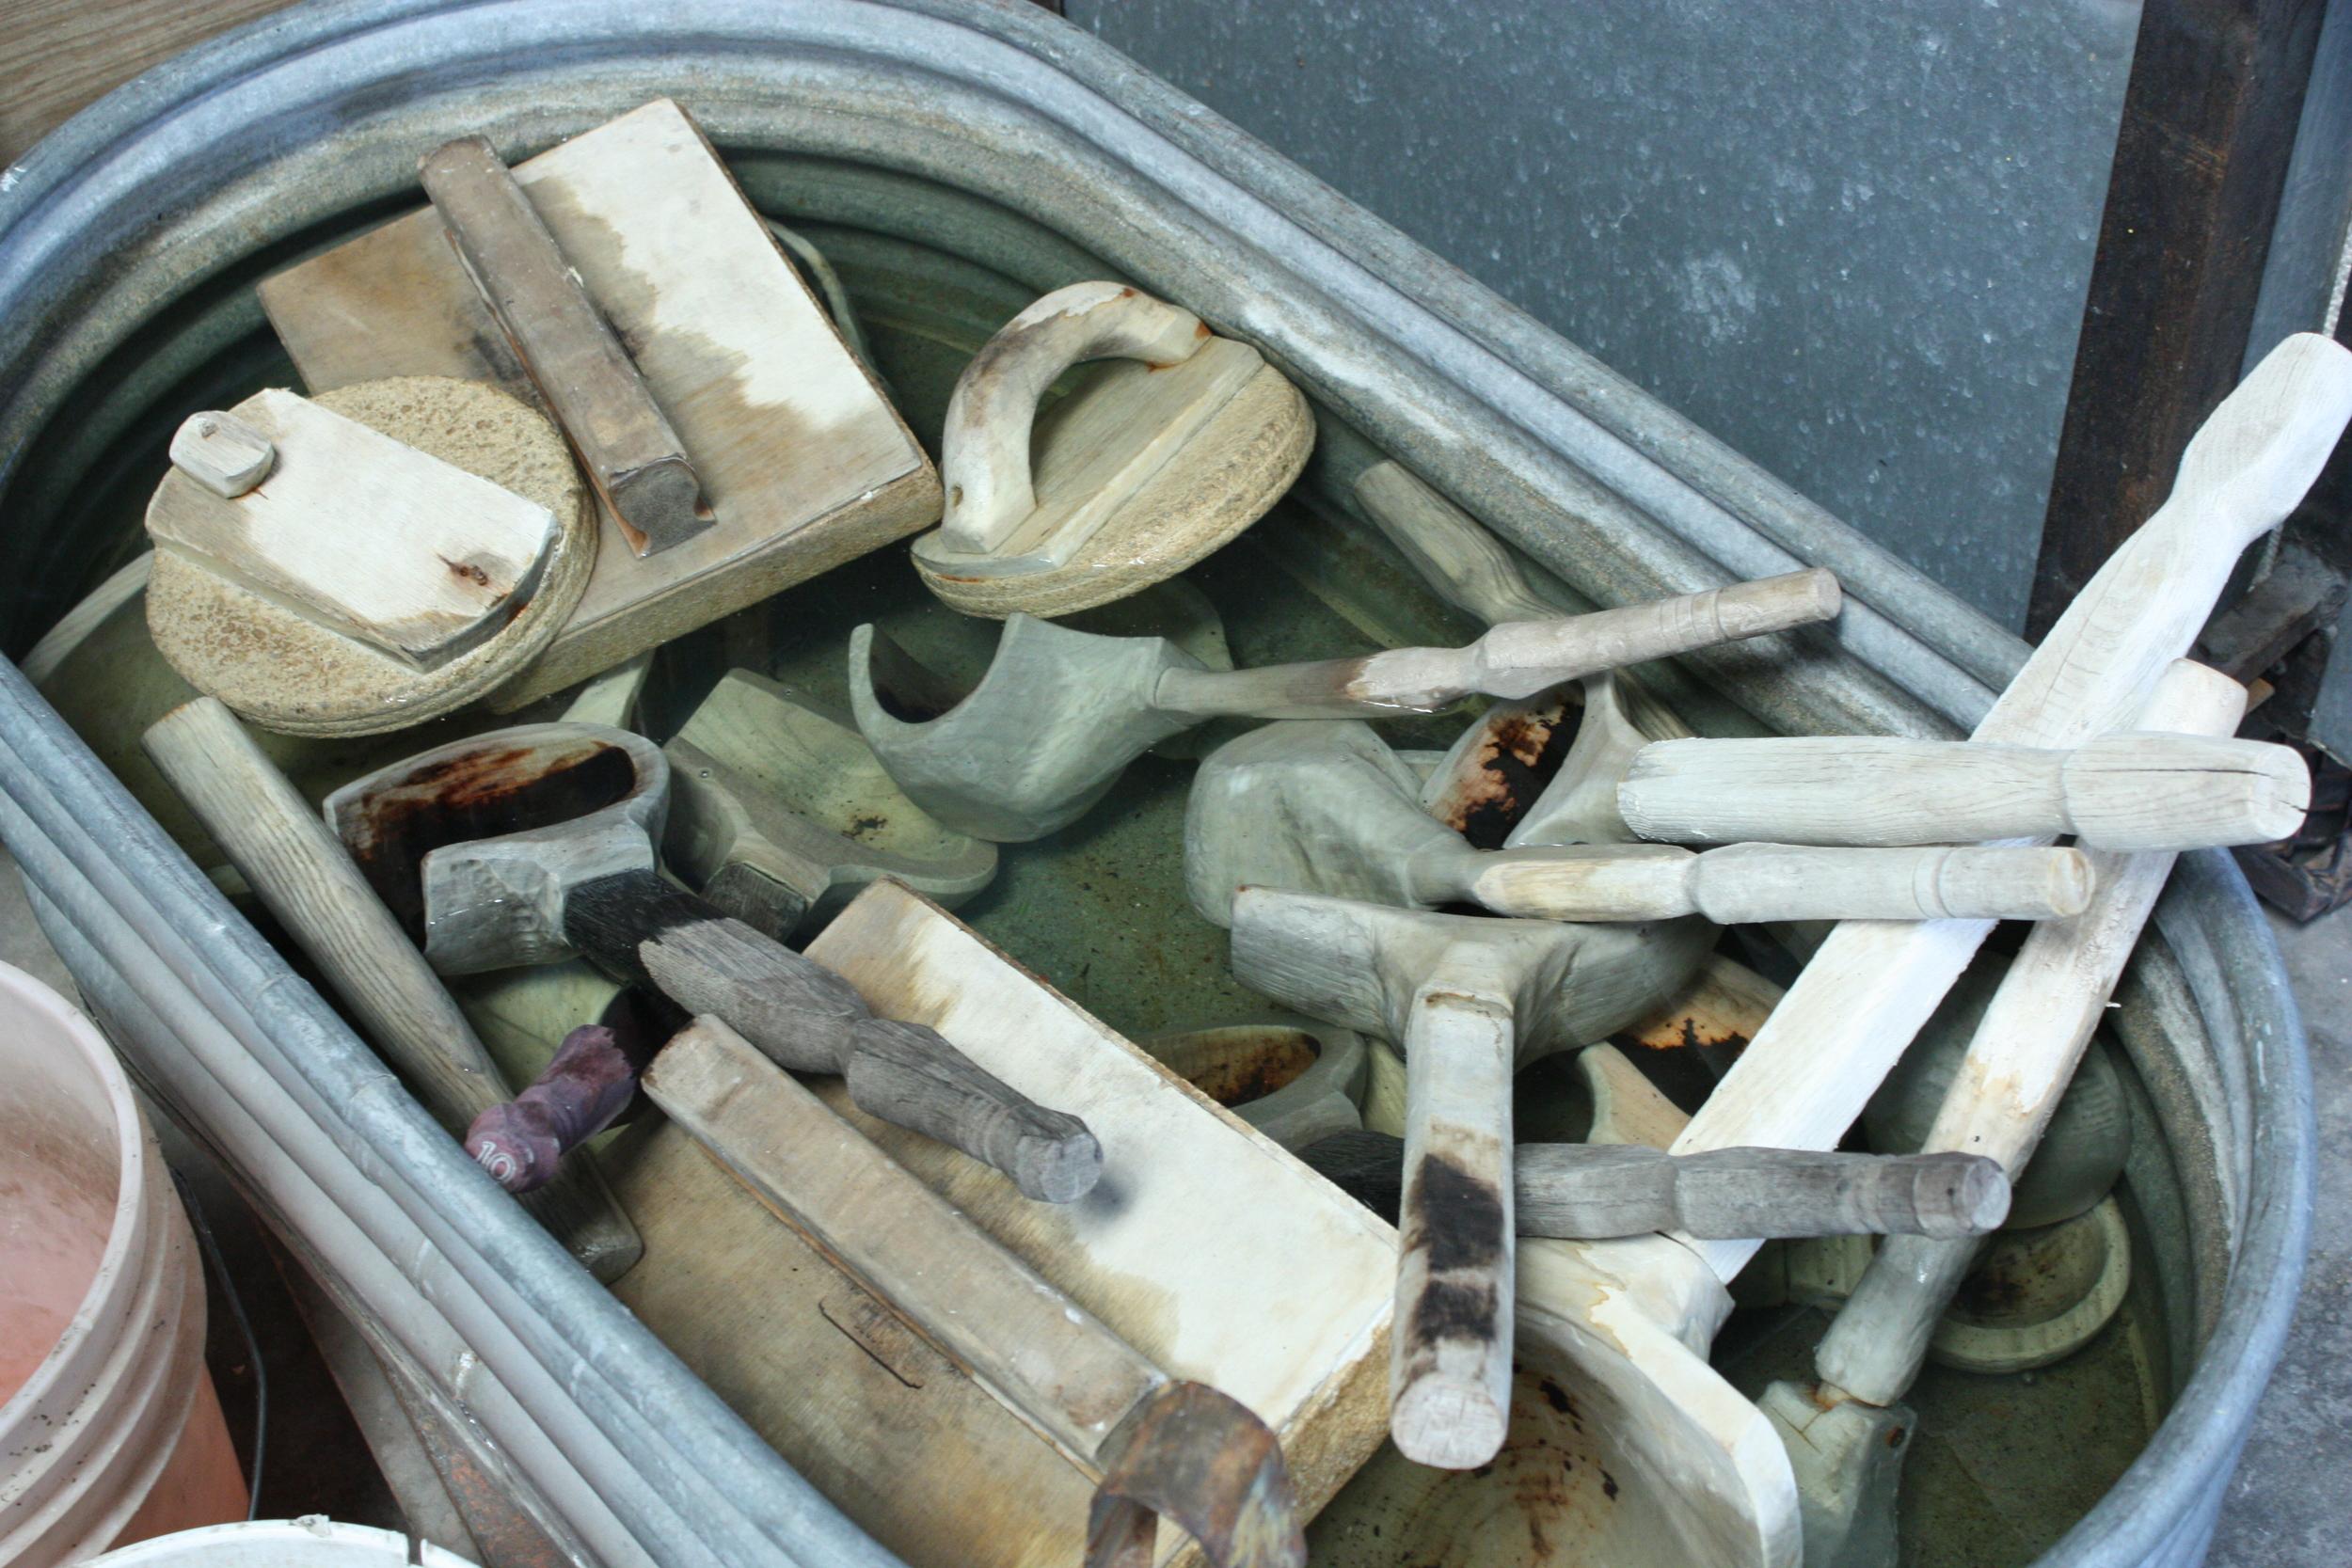 Closeup of the wooden tools.